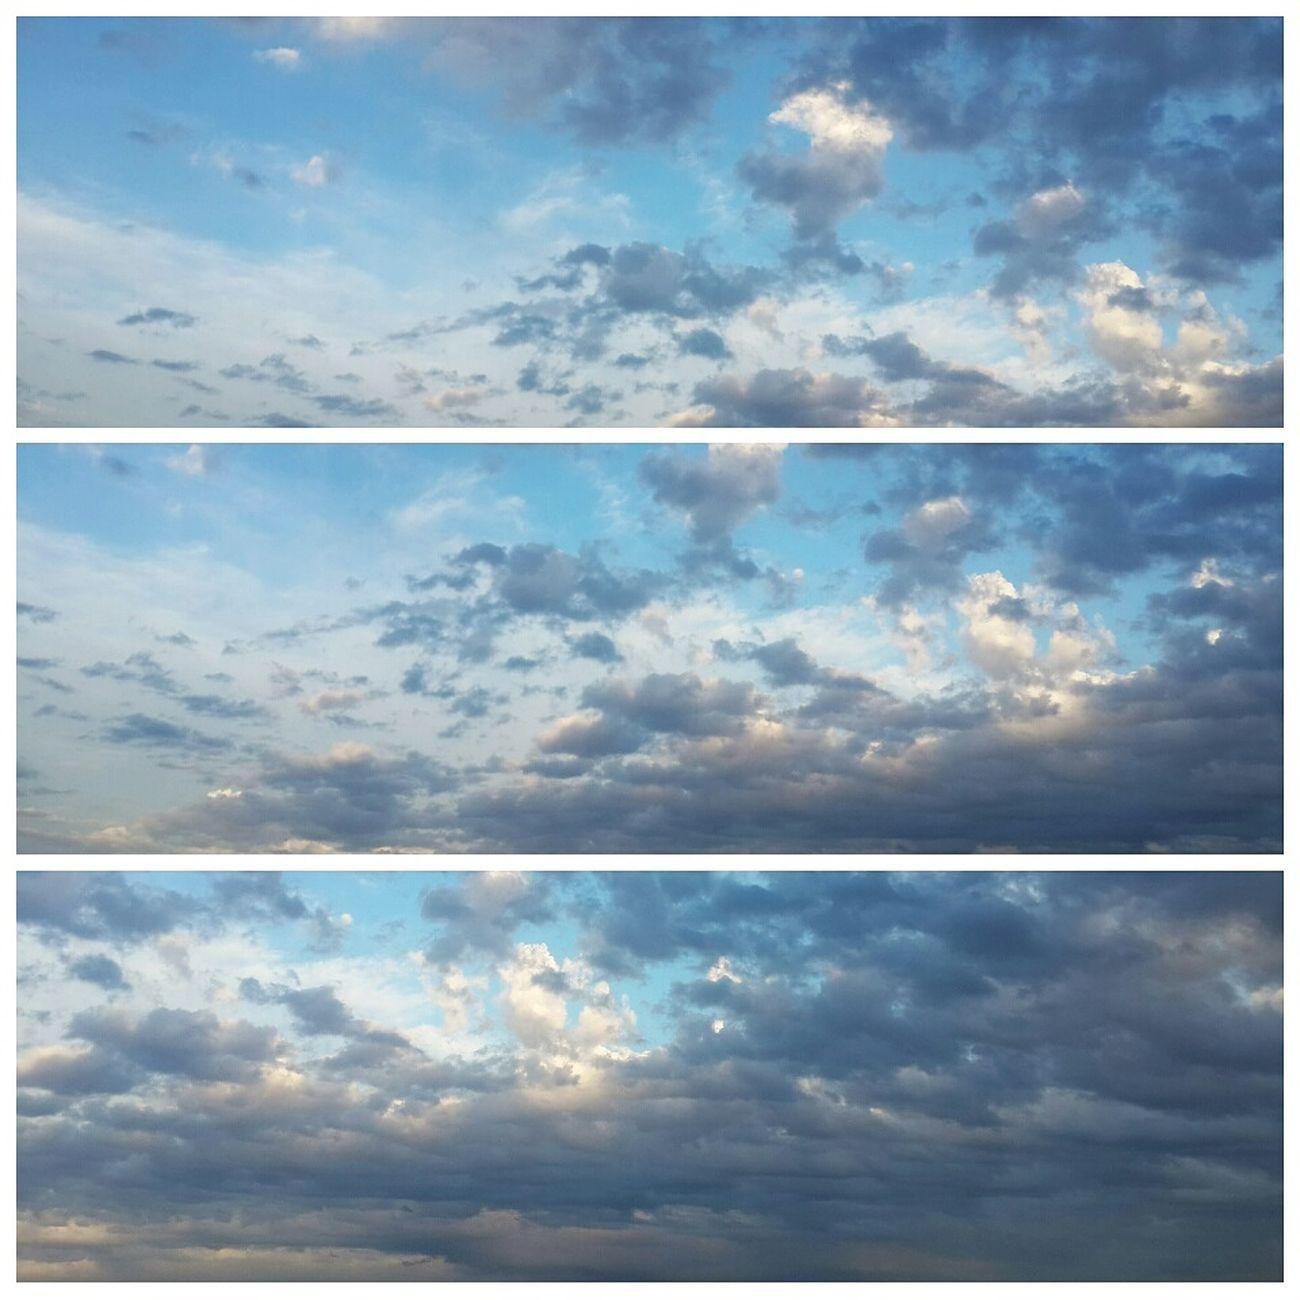 Cloud - Sky Sky Blue Cloudscape Water Beauty In Nature Tranquility Sea No People Nature Outdoors Scenics Day Horizon Over Water Sun Kadrajımdanyansıyanlar Kadrajturkiye Samsung Galaxy S4 Nature Kadraj_turkiye